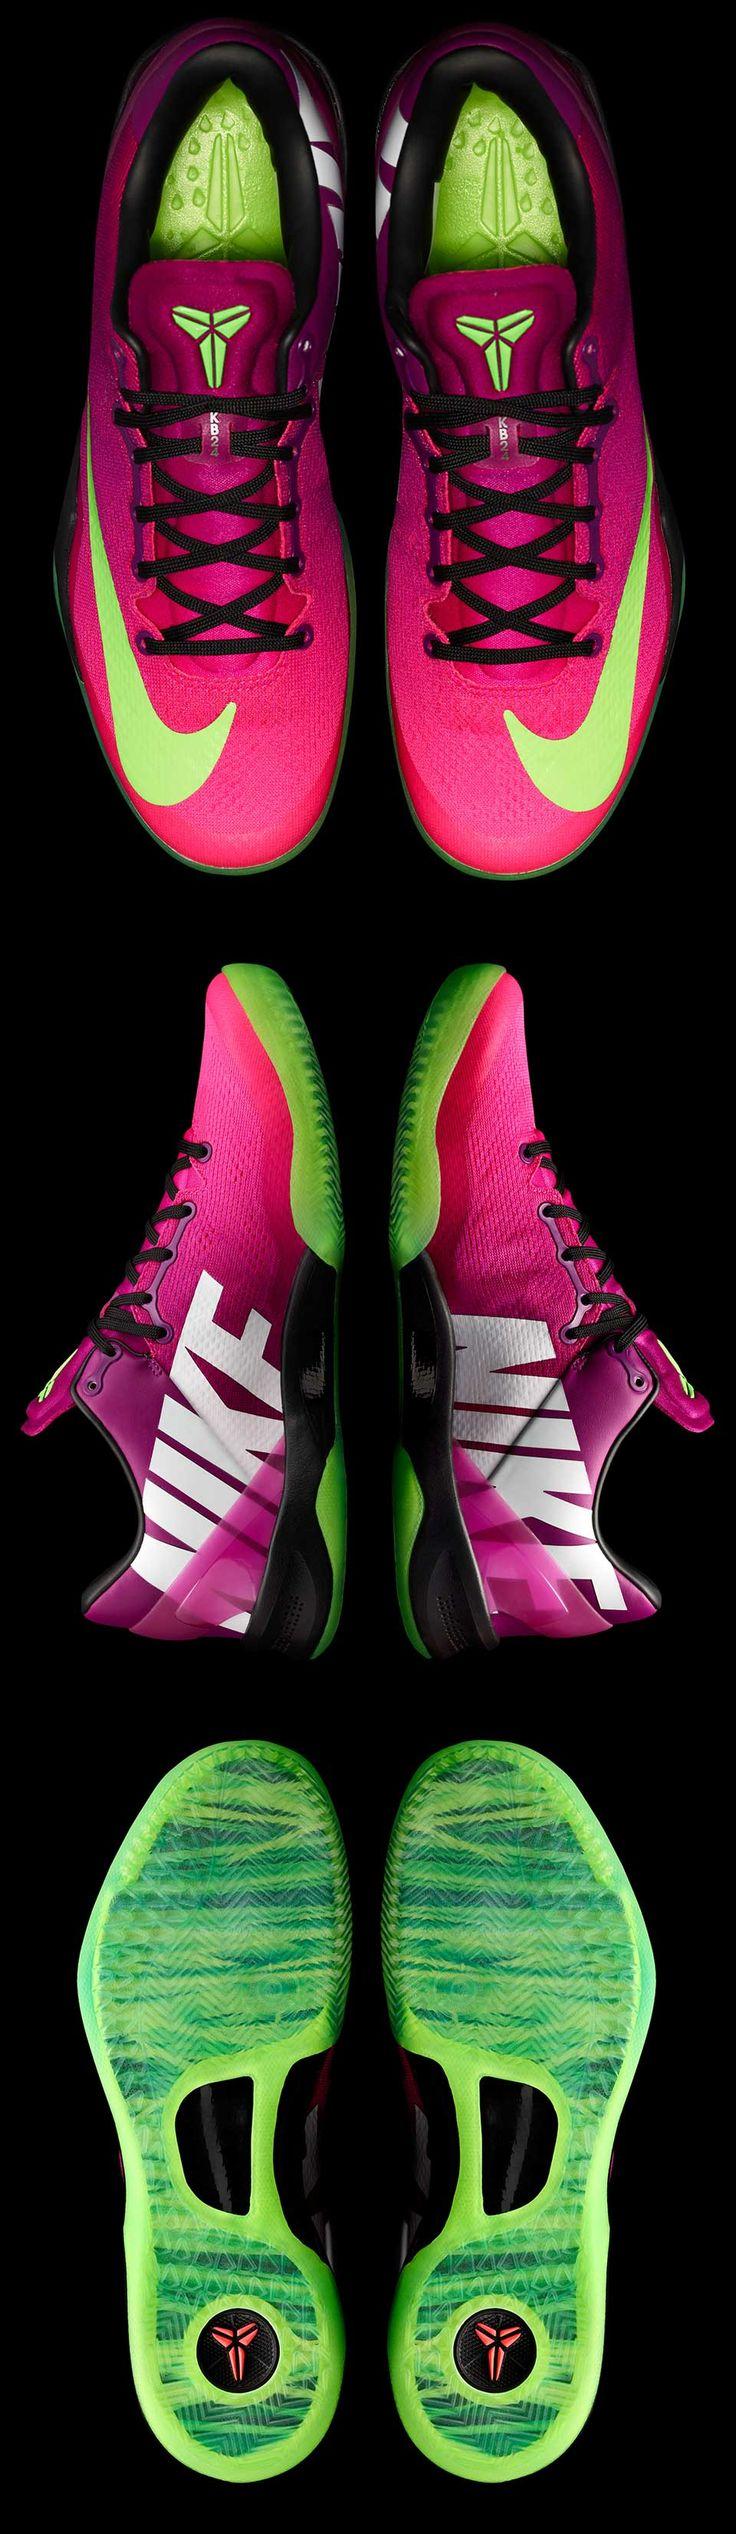 Nike Kobe Mambacurial basketball shoe